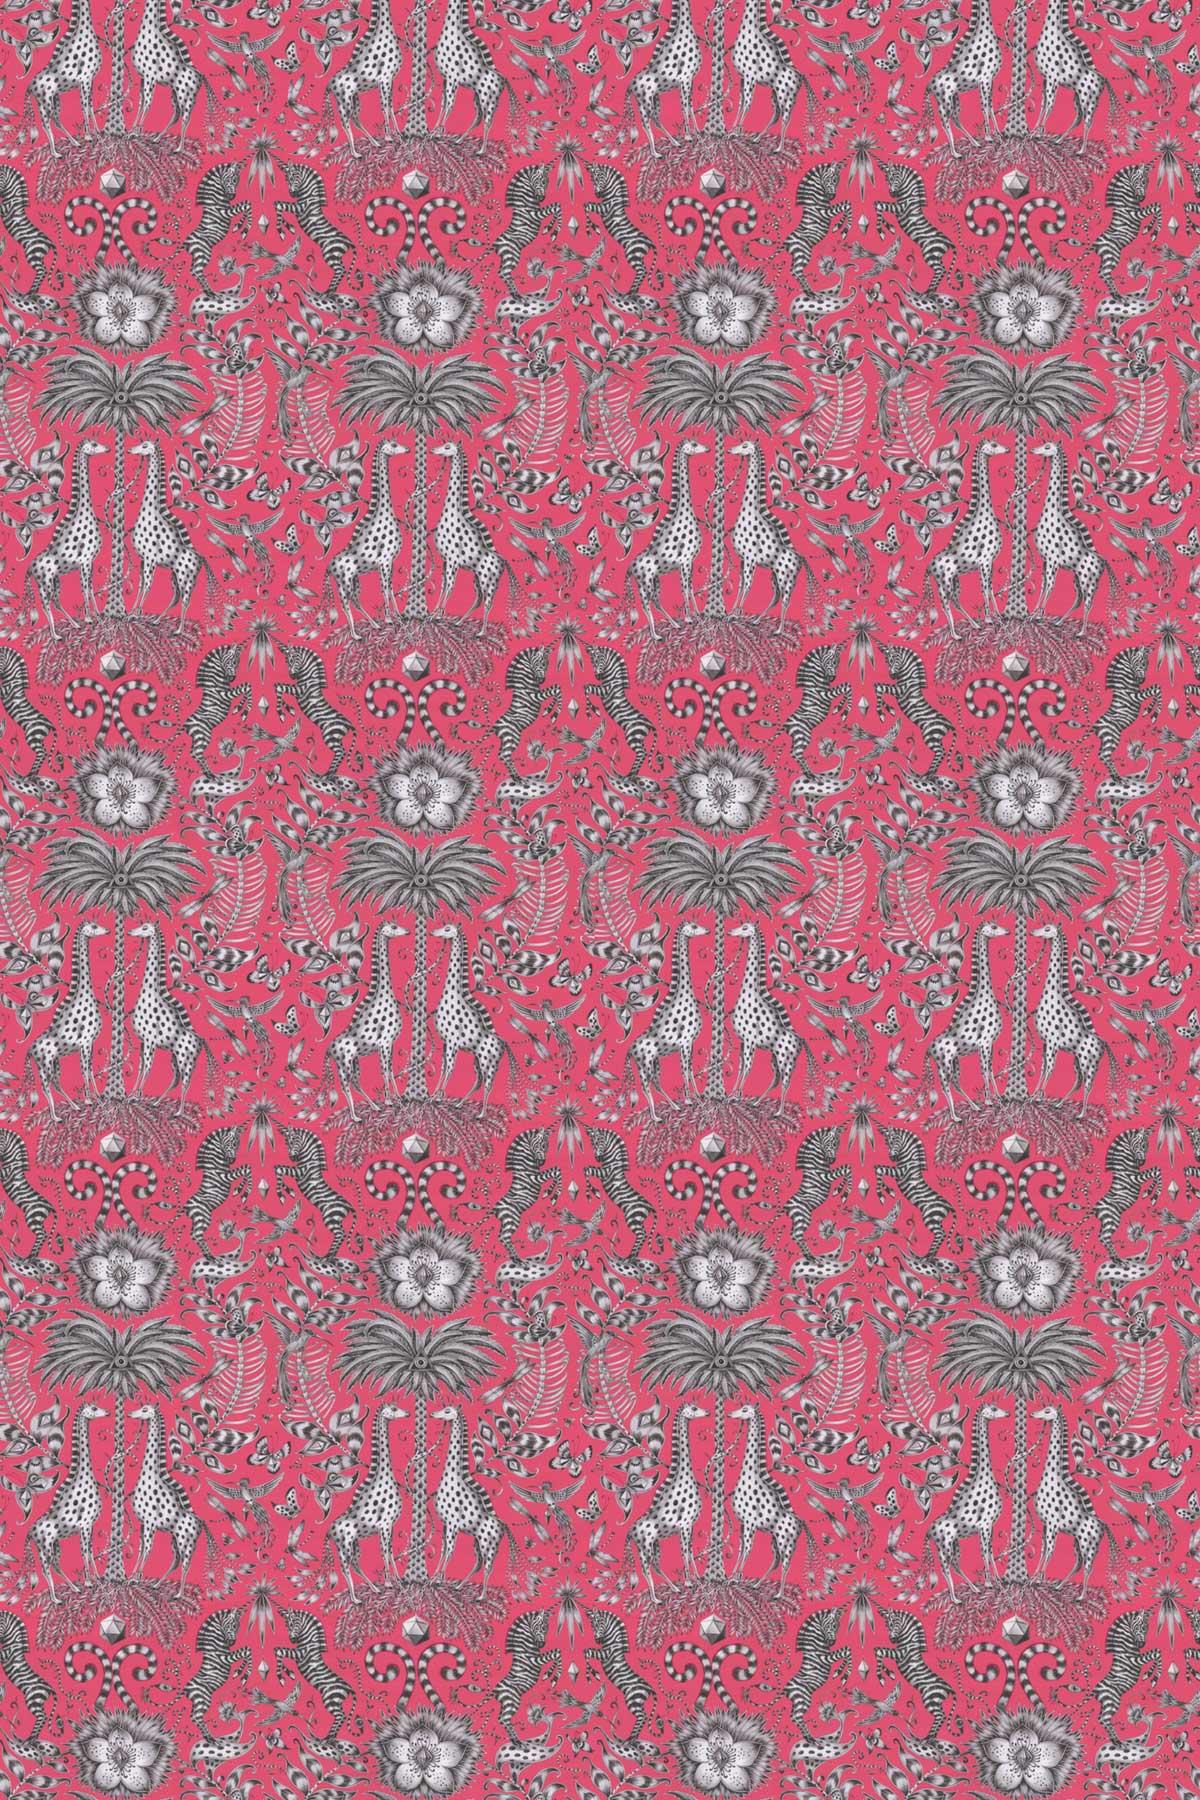 Kruger Fabric - Magenta - by Emma J Shipley